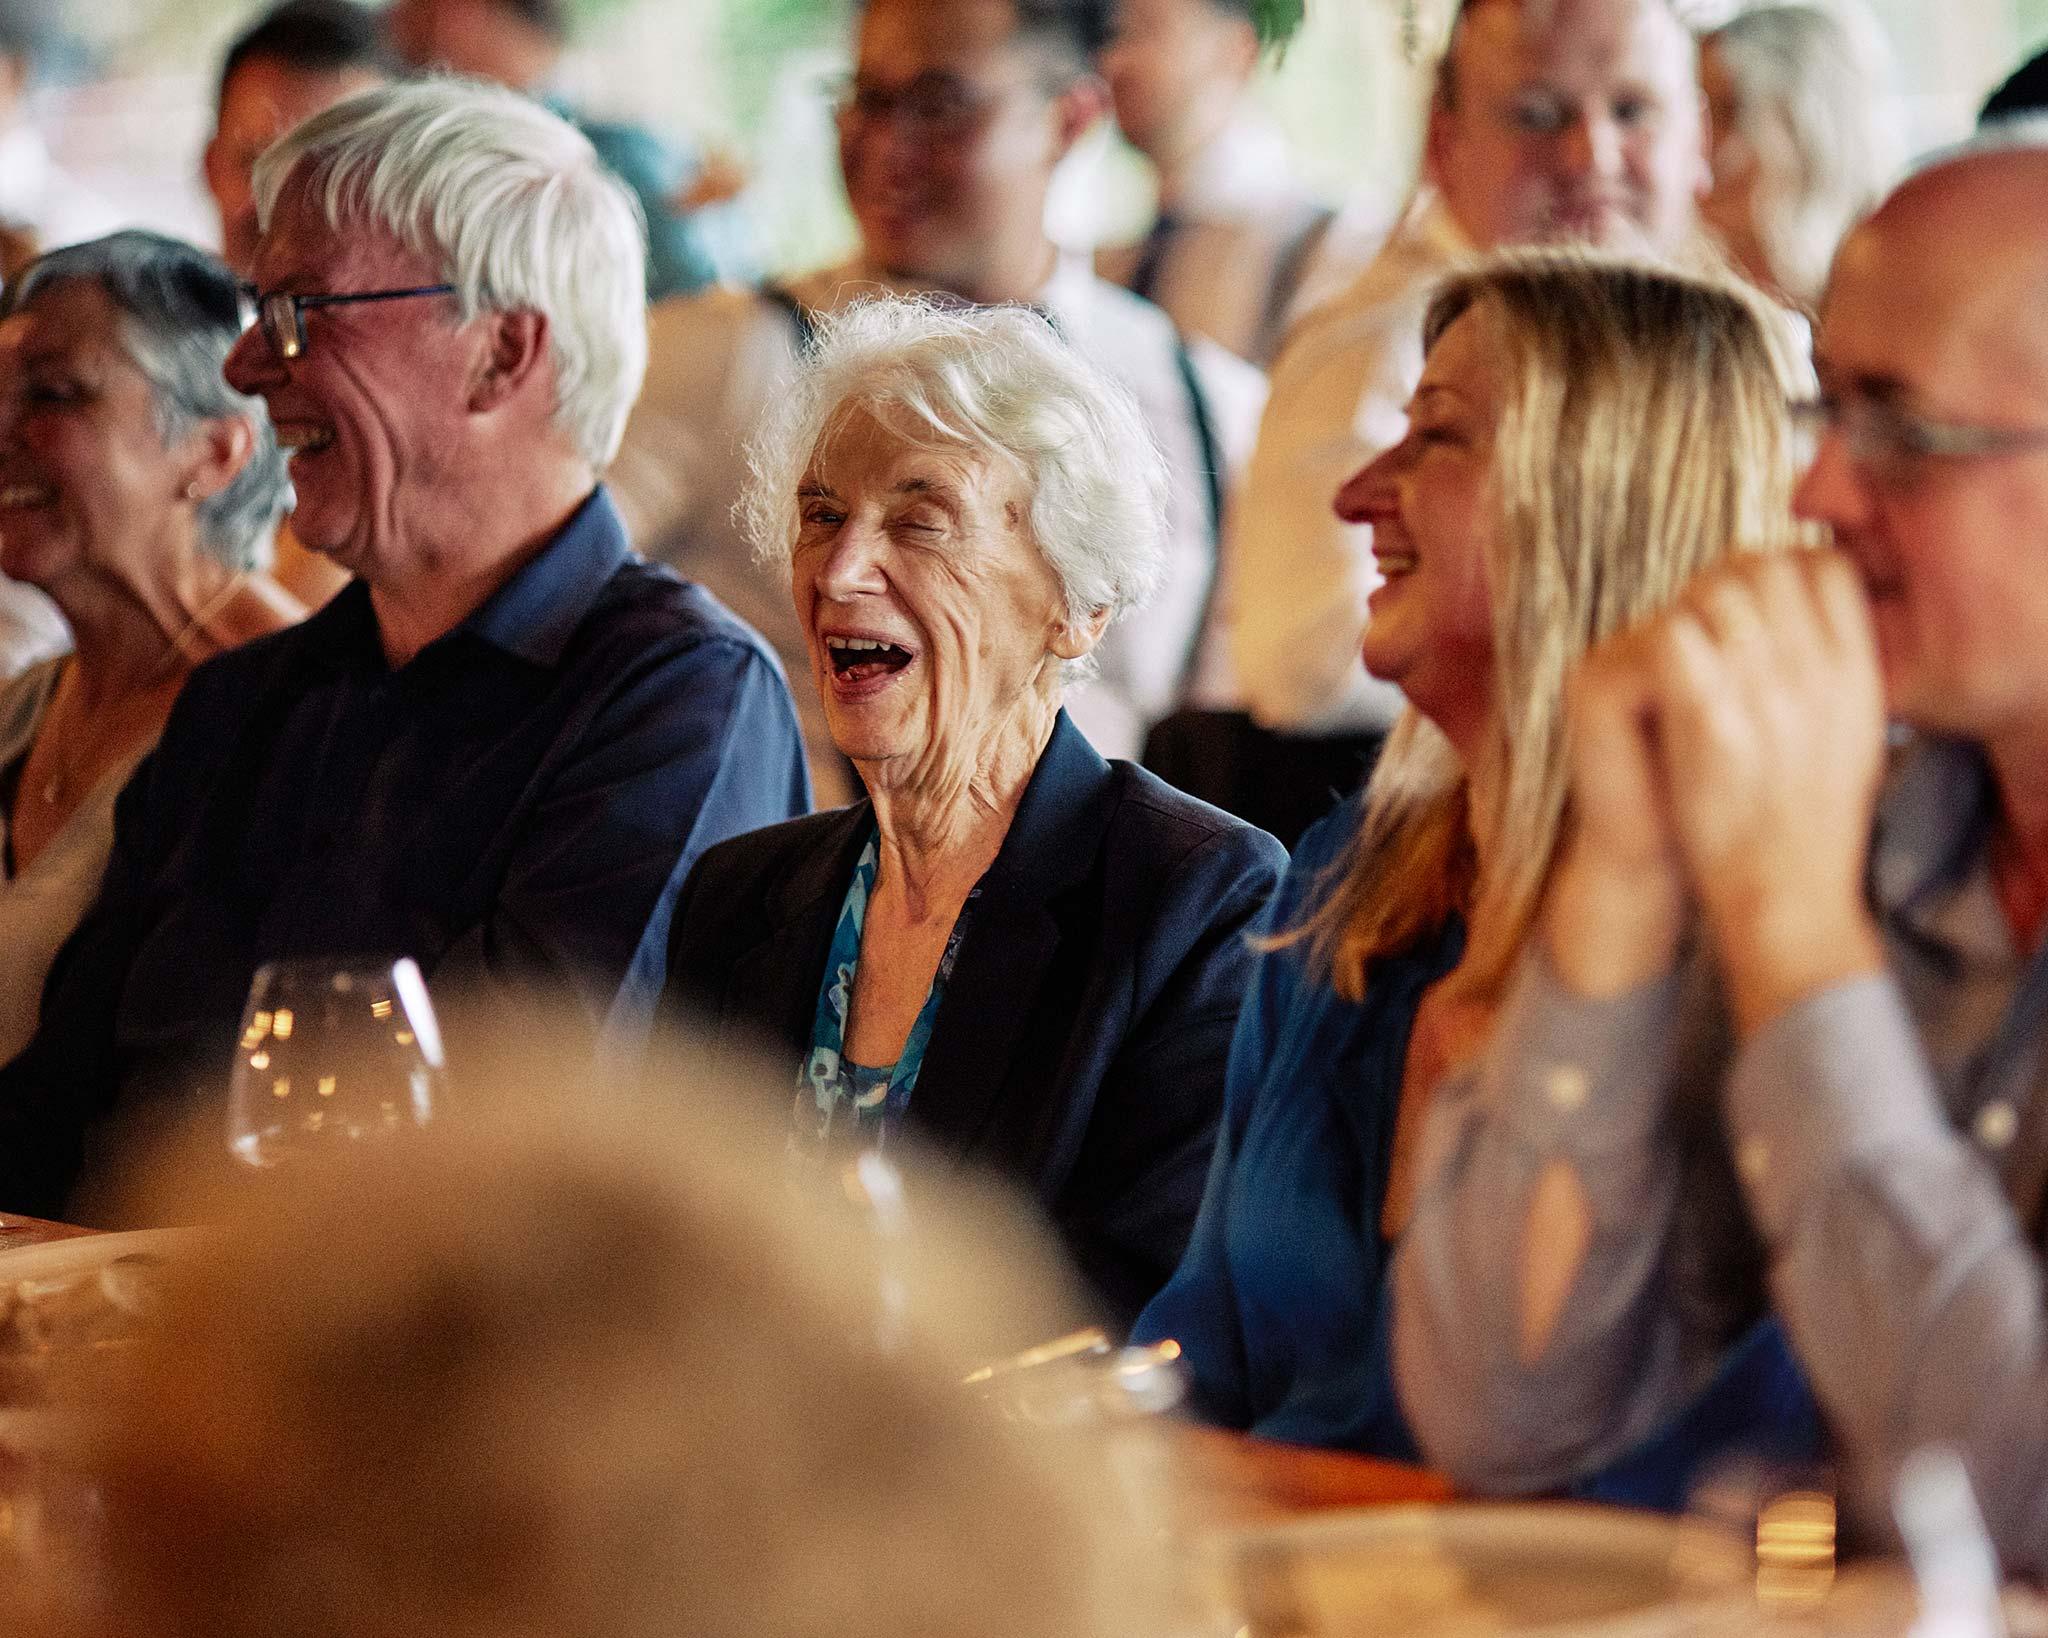 zonzo wedding photography speeches reaction